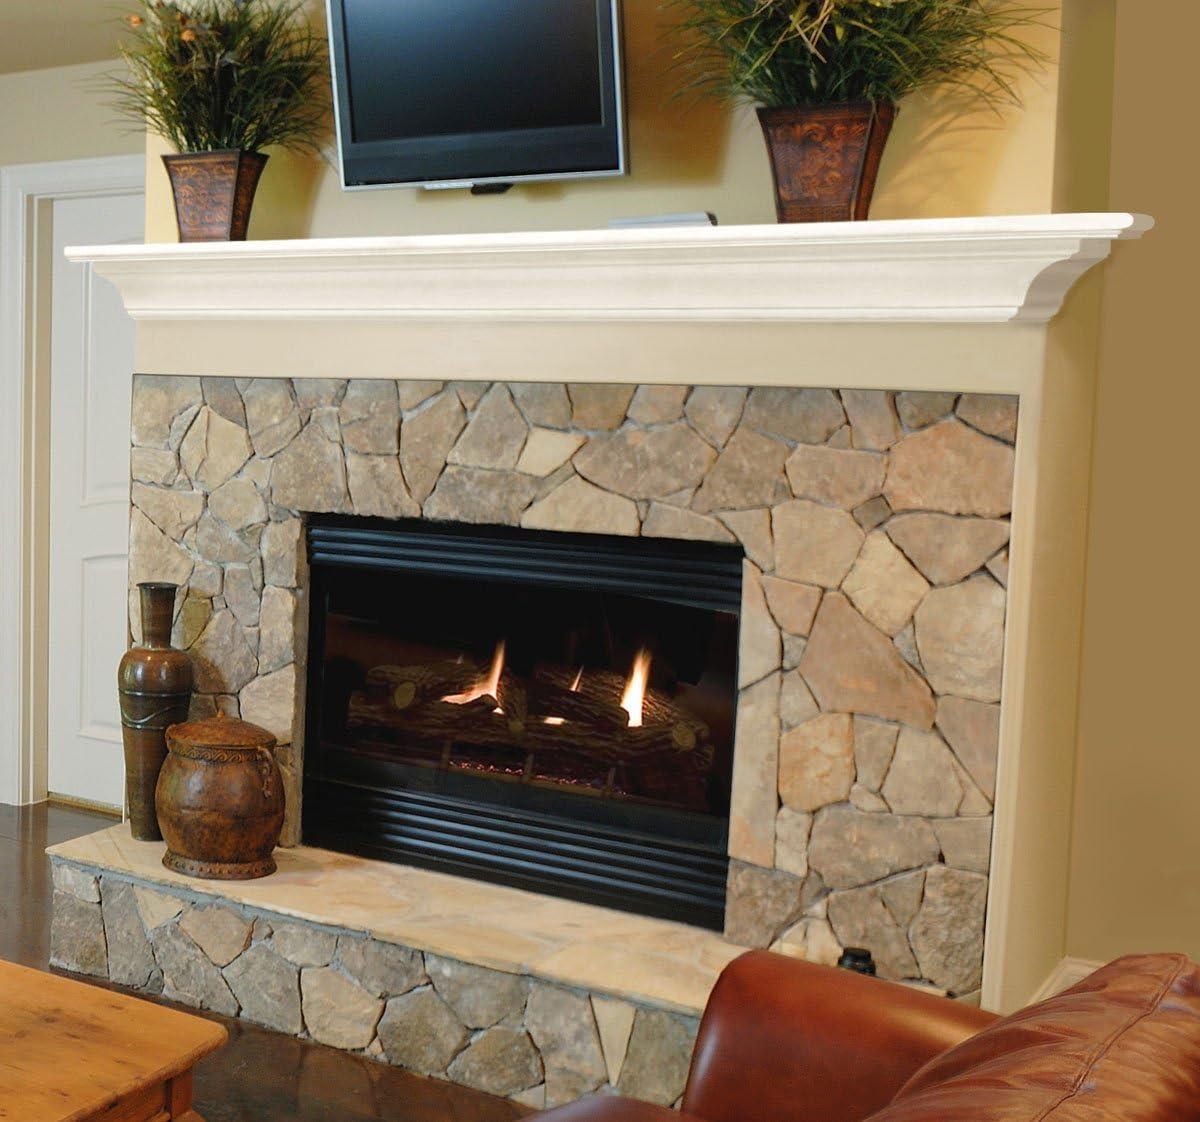 Pearl Mantels 618-72 Crestwood Mantel Shelf, 72-Inch, White